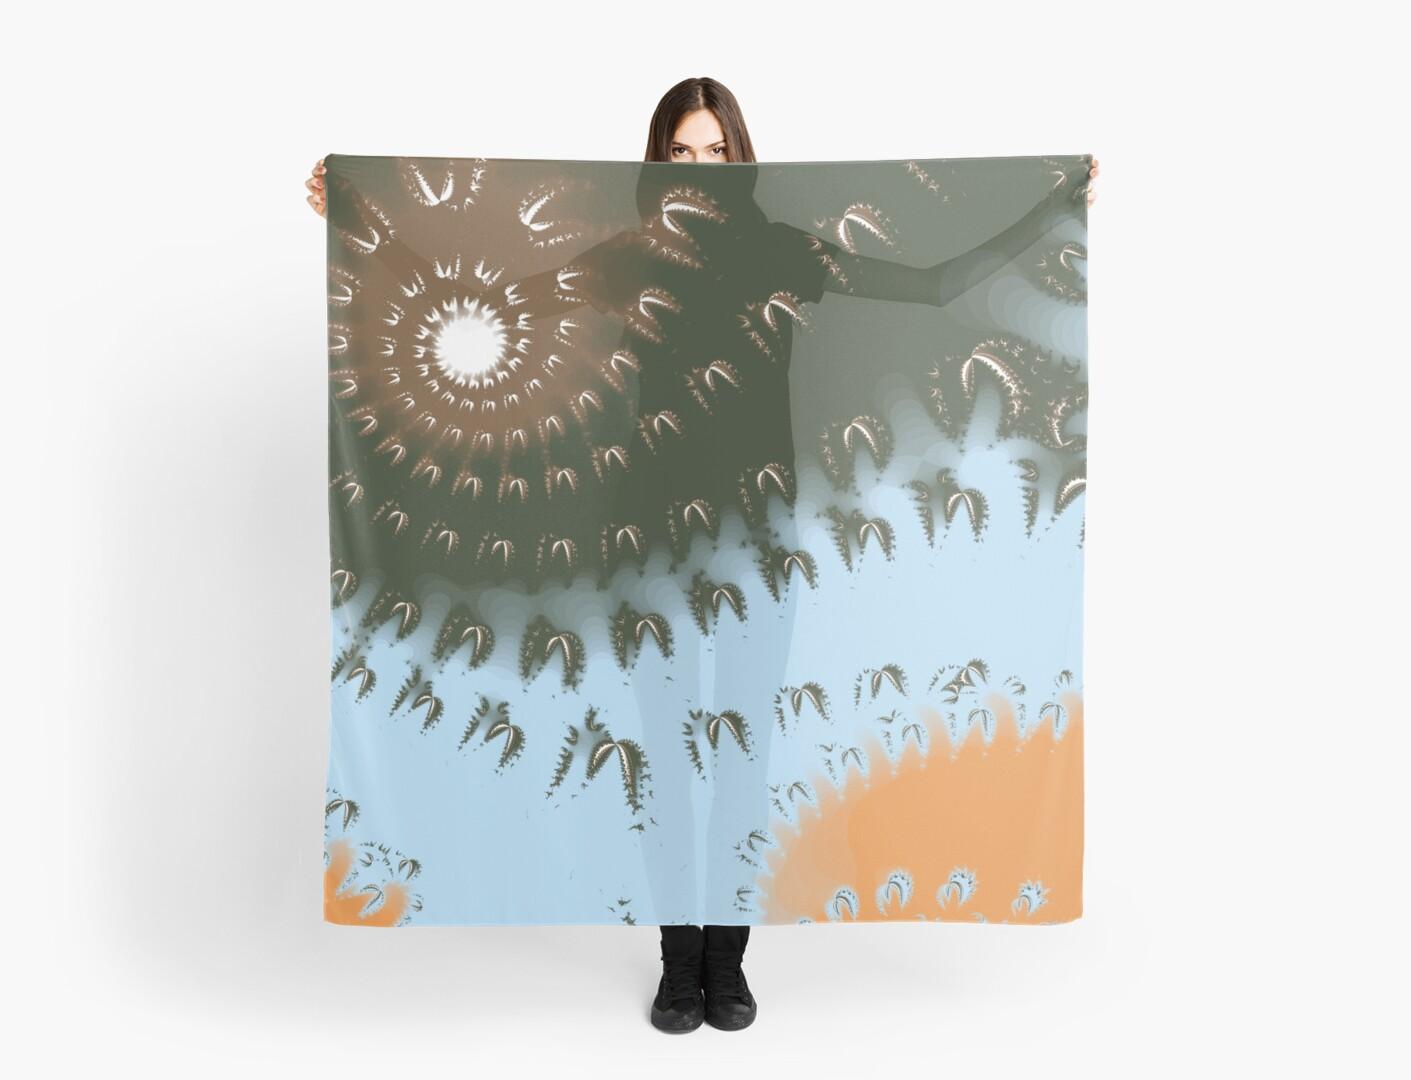 Sun Ray Swirl Design by Jessielee72